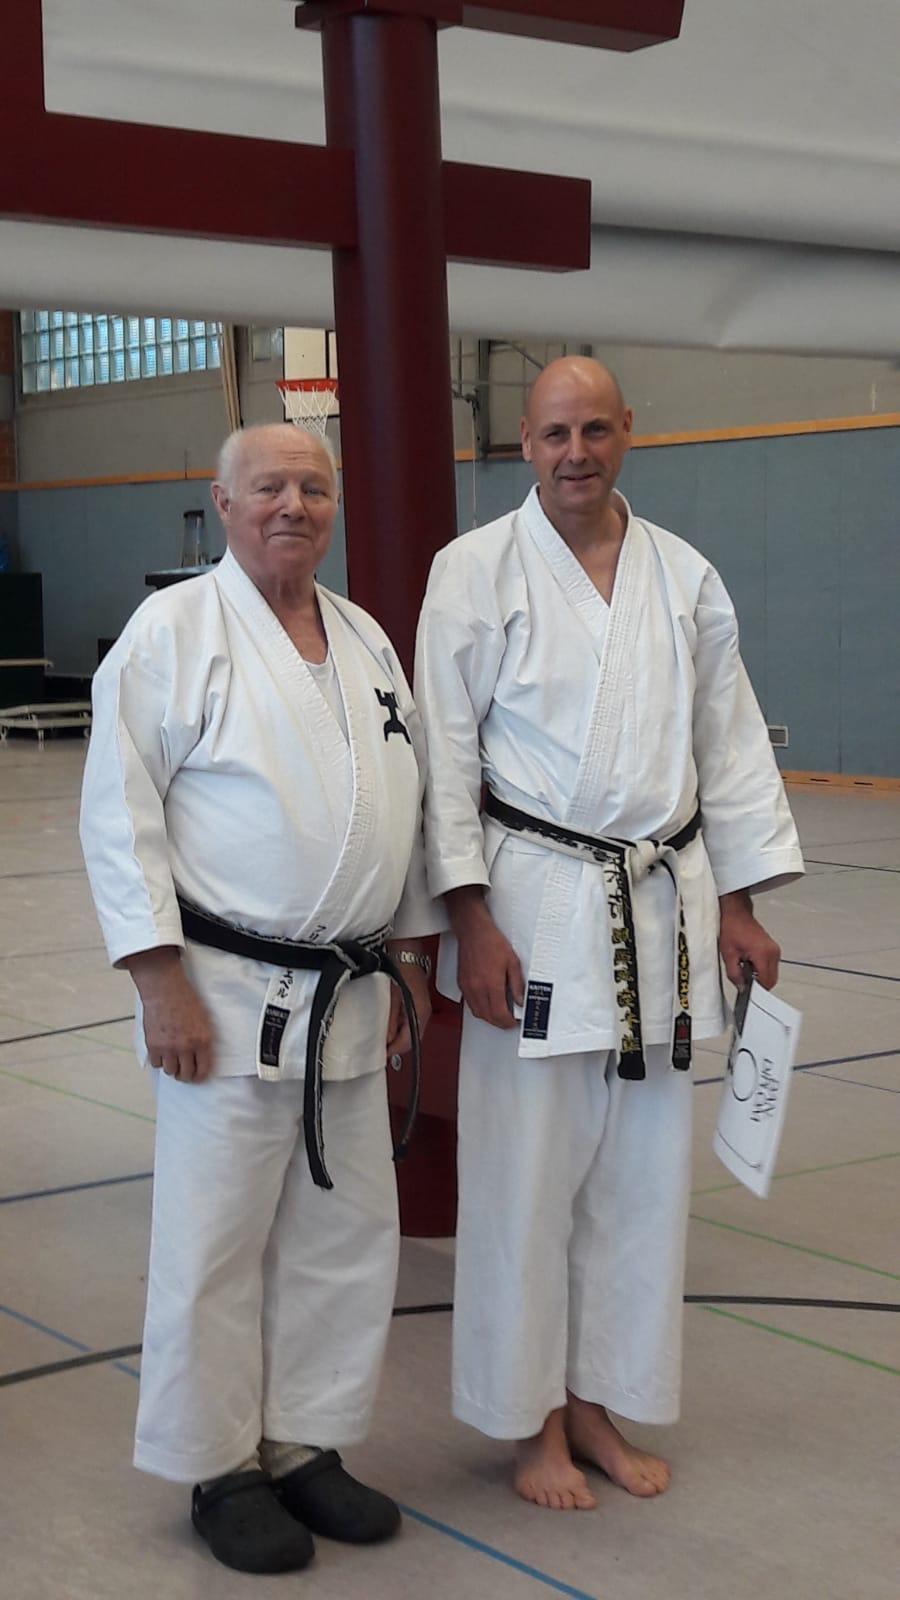 Karate Dan Prüfung Fitz Nöpel und René Roese